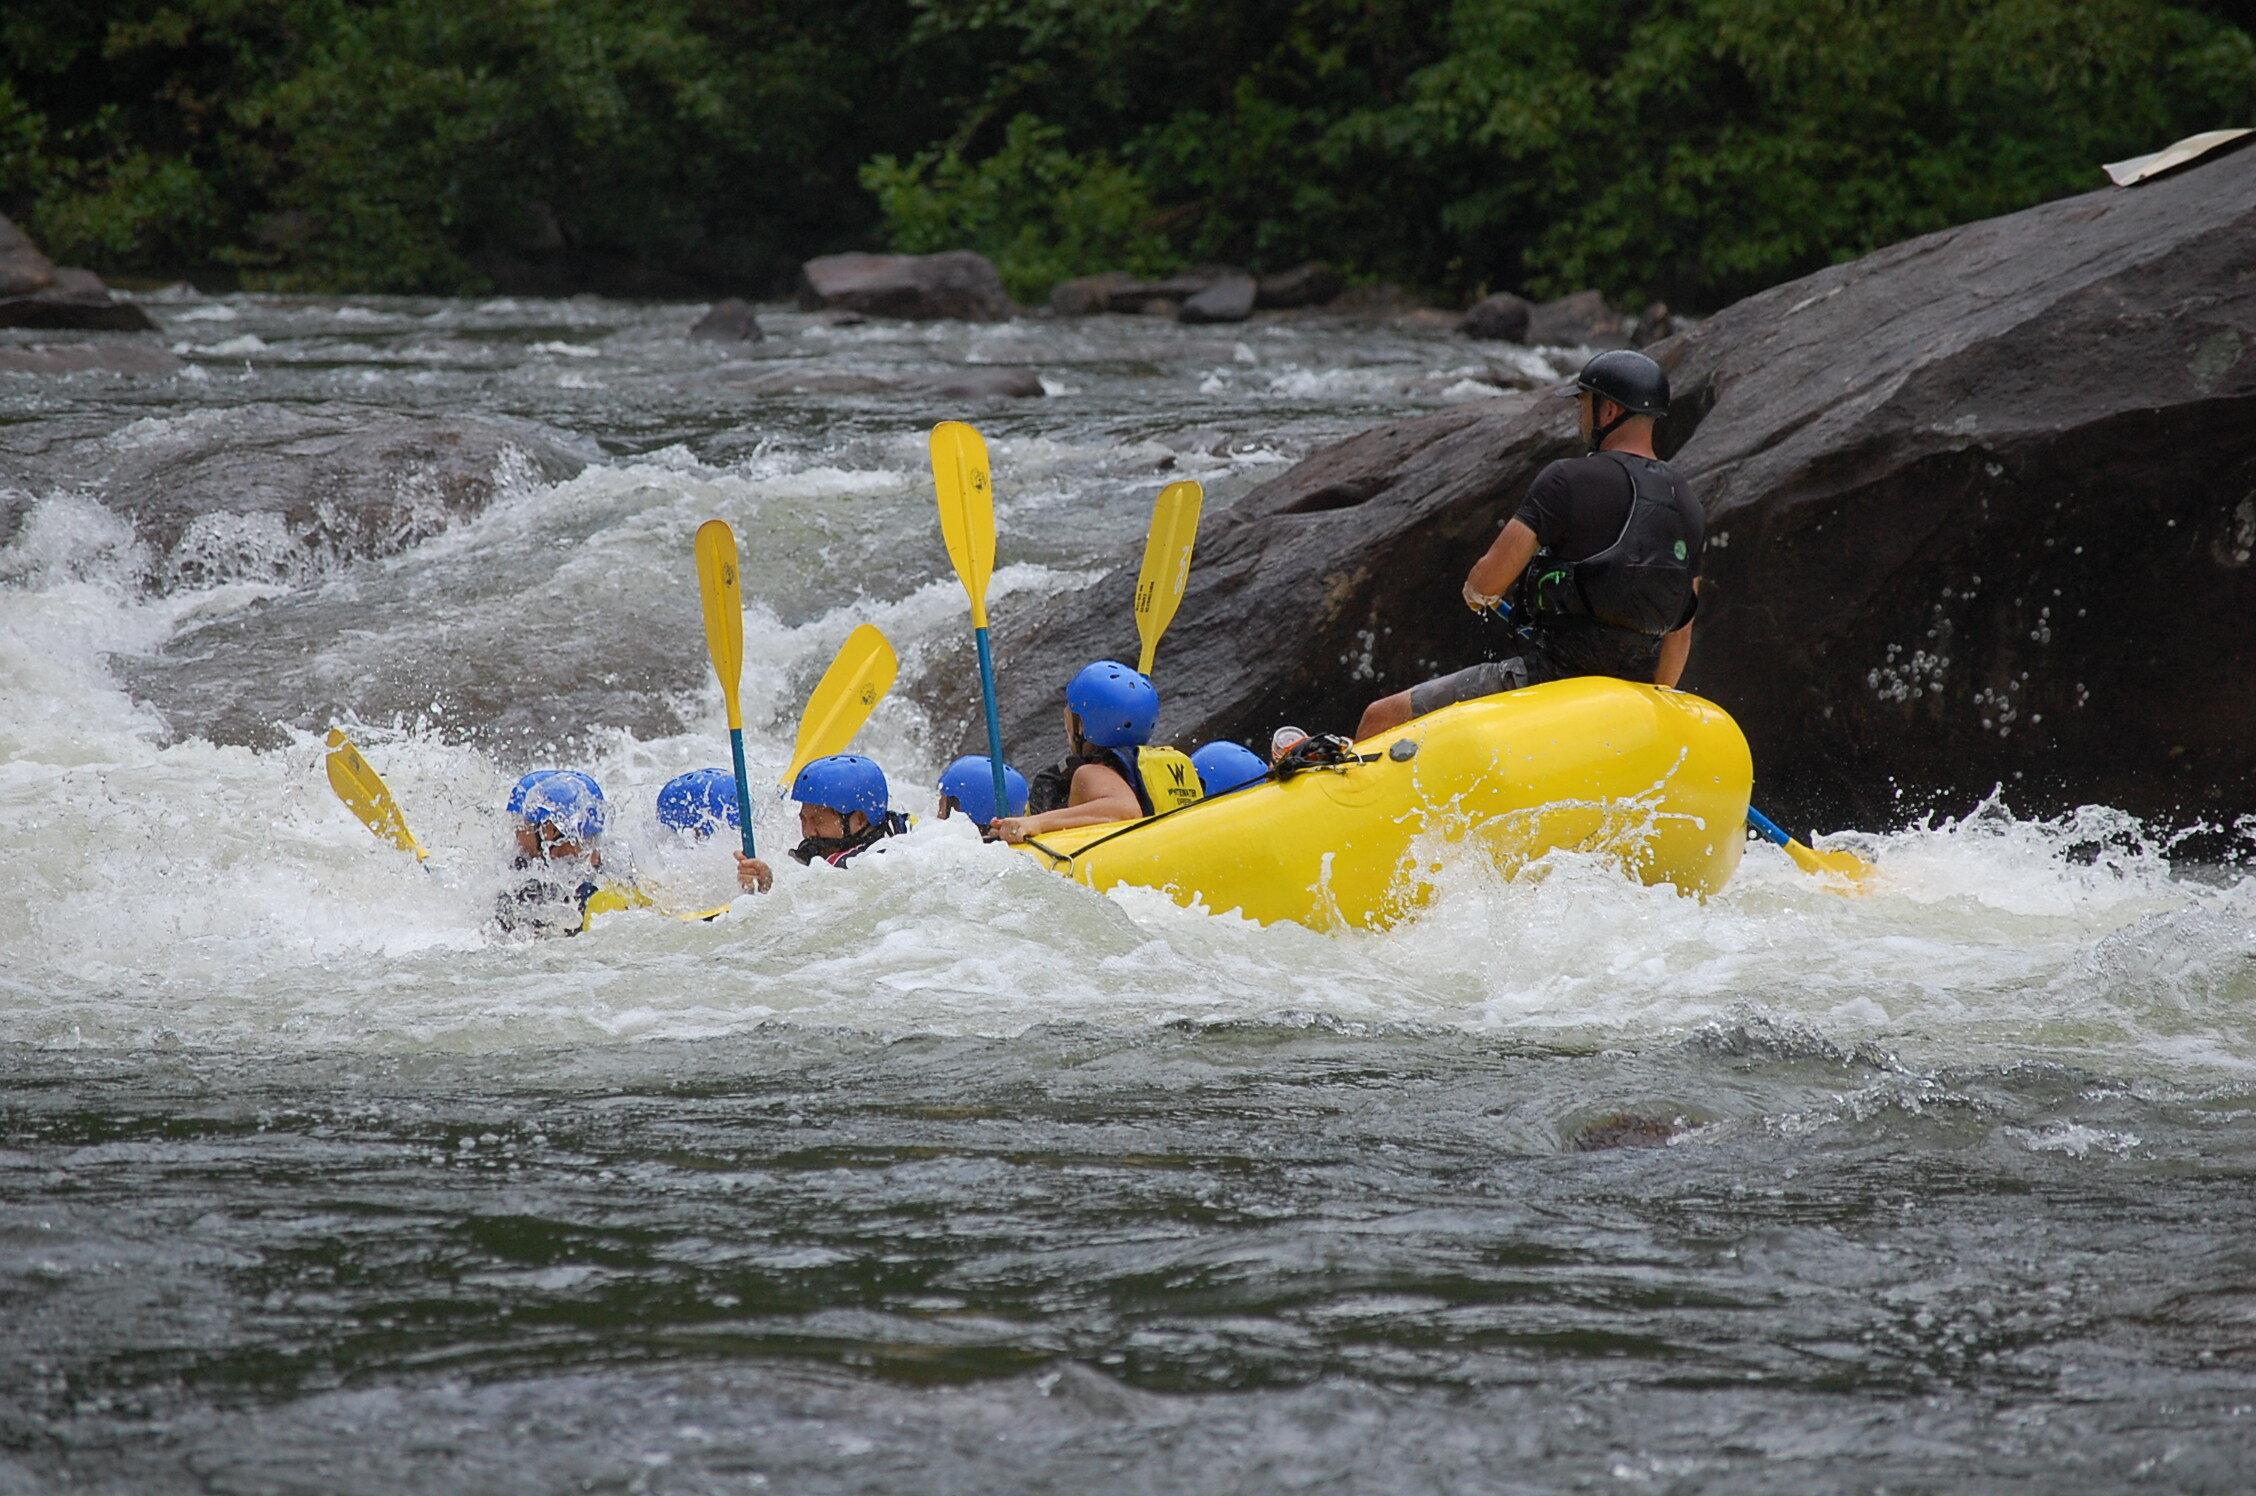 whitewater rafting - Location:Arkansas River, SalidaPrice: $70/personGroup Minimum/Maximum: 8/30